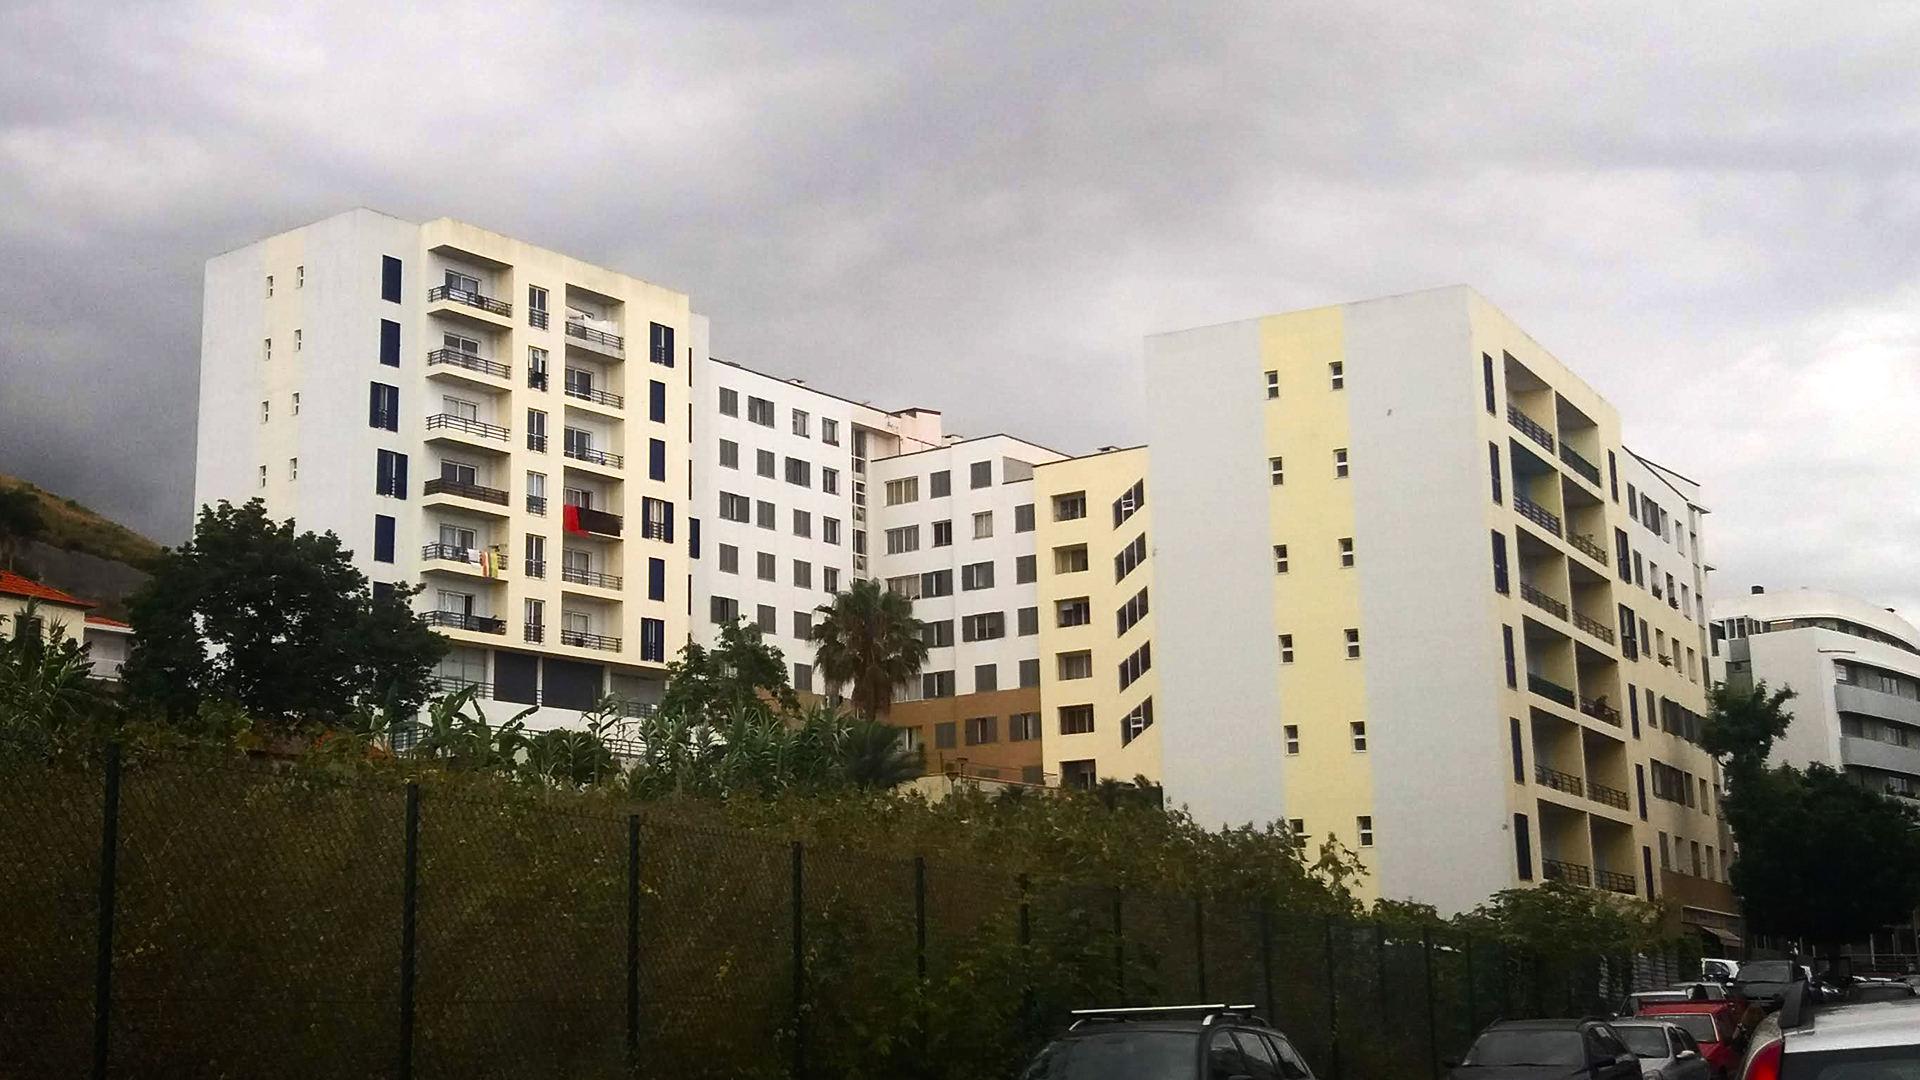 apartaments brazao gardens interpatium